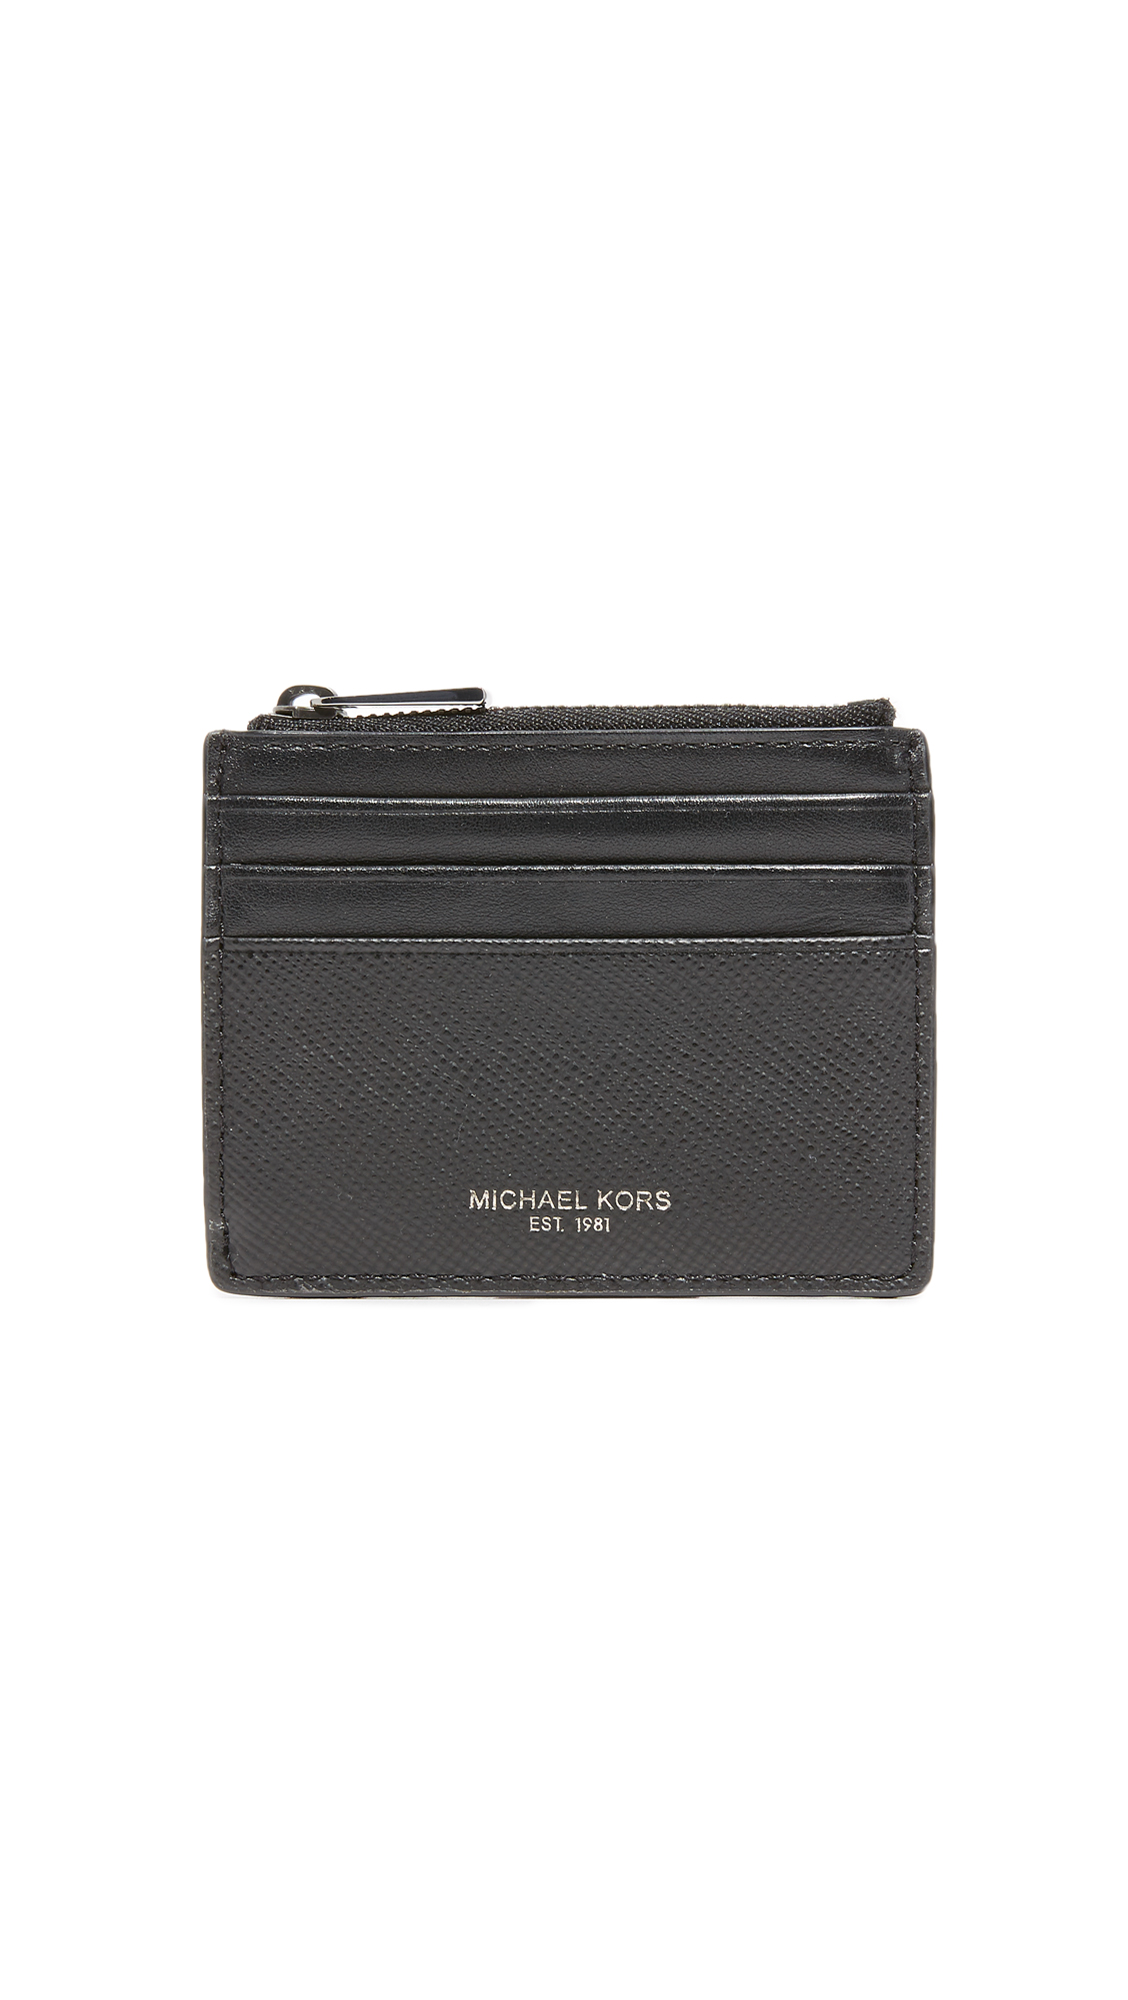 Michael Kors Harrison Leather Card Holder In Black